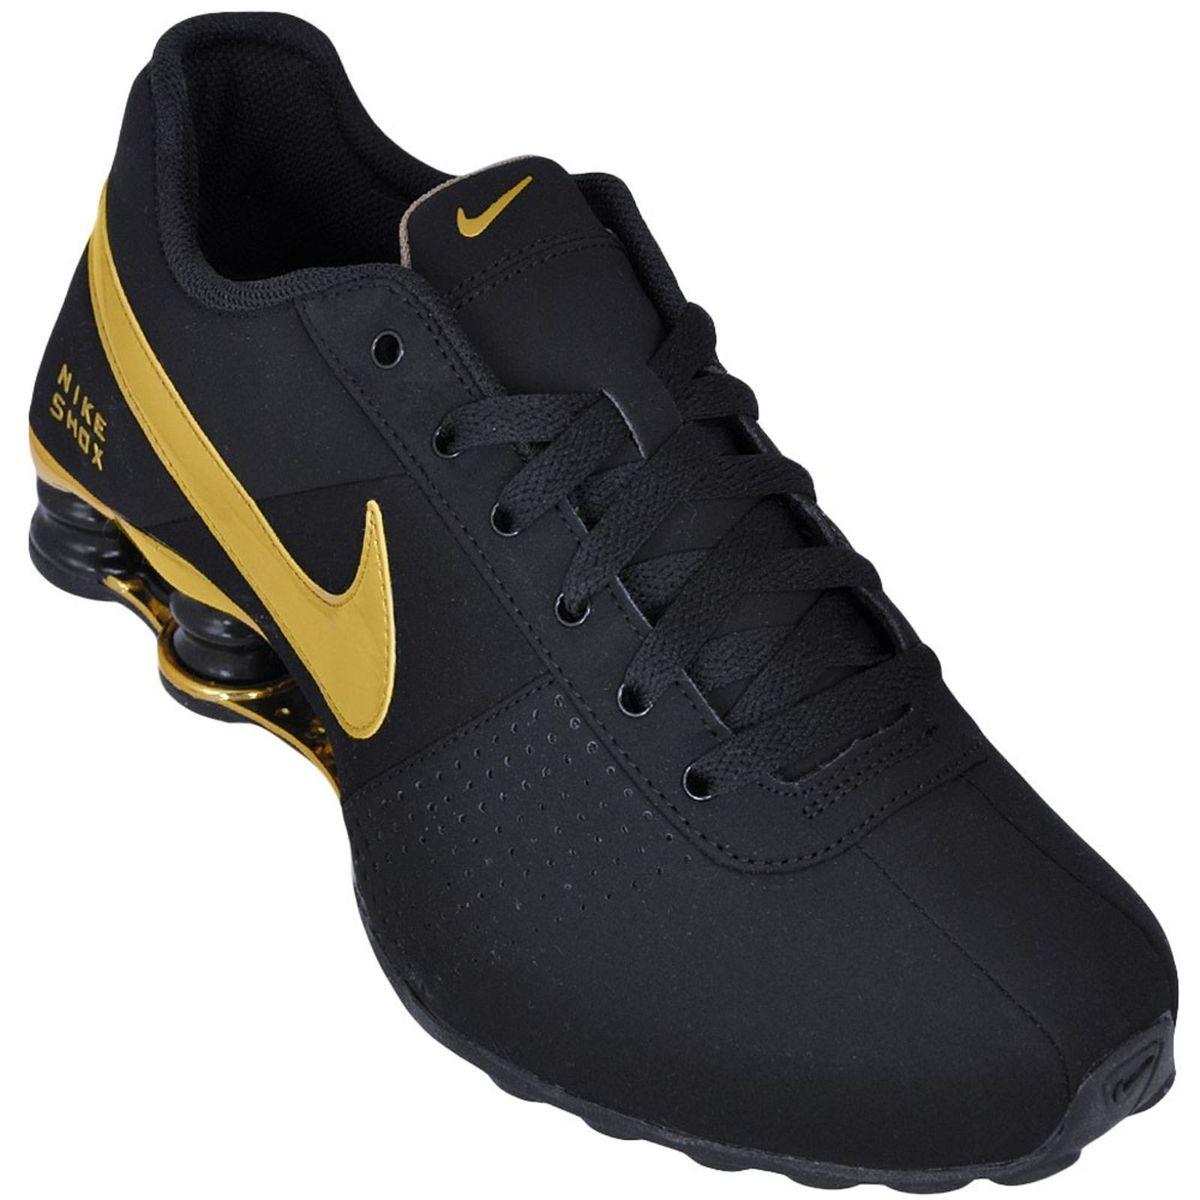 new product e0850 d67d1 Tenis Nike Shox Deliver Classic   Tênis Masculino Nike Nunca Usado 20951732    enjoei